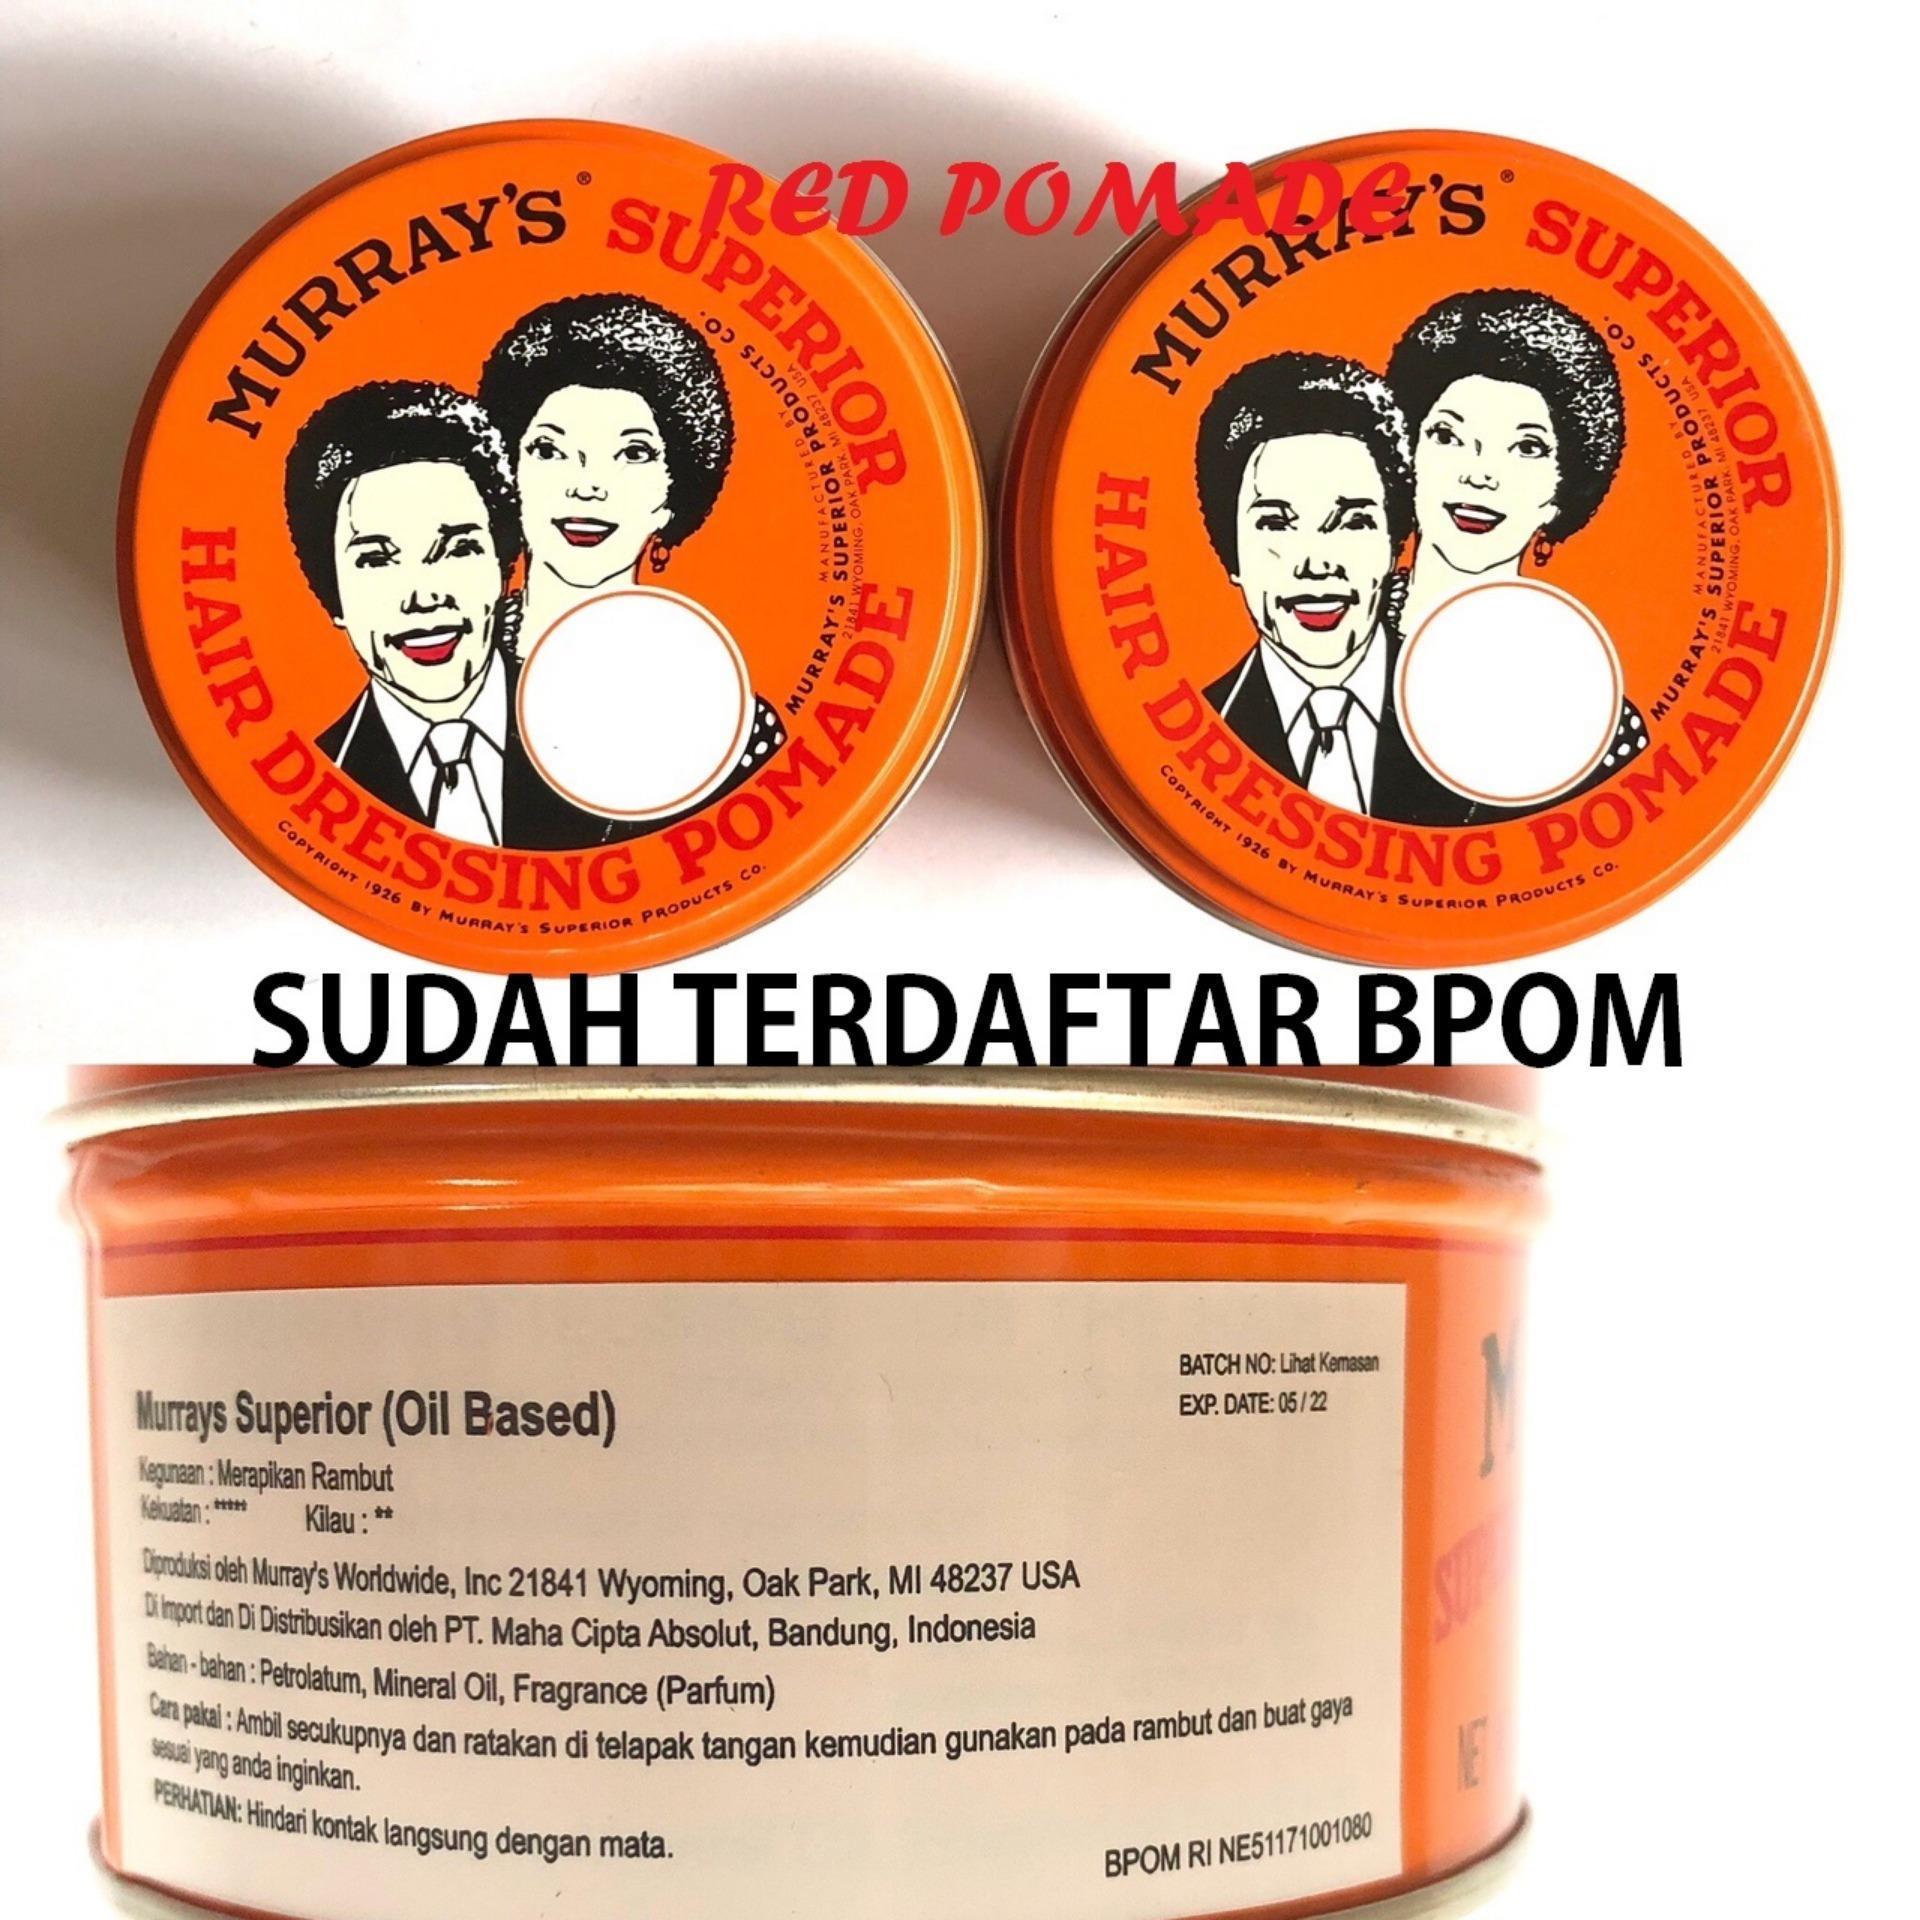 Kehebatan Dunhal Dunahl Pomade Type Xtr Oil Based 3 5oz Qn2gfj Minyak Rambut Tm Kopi Murrays Superior Oz Heavy Oilbased